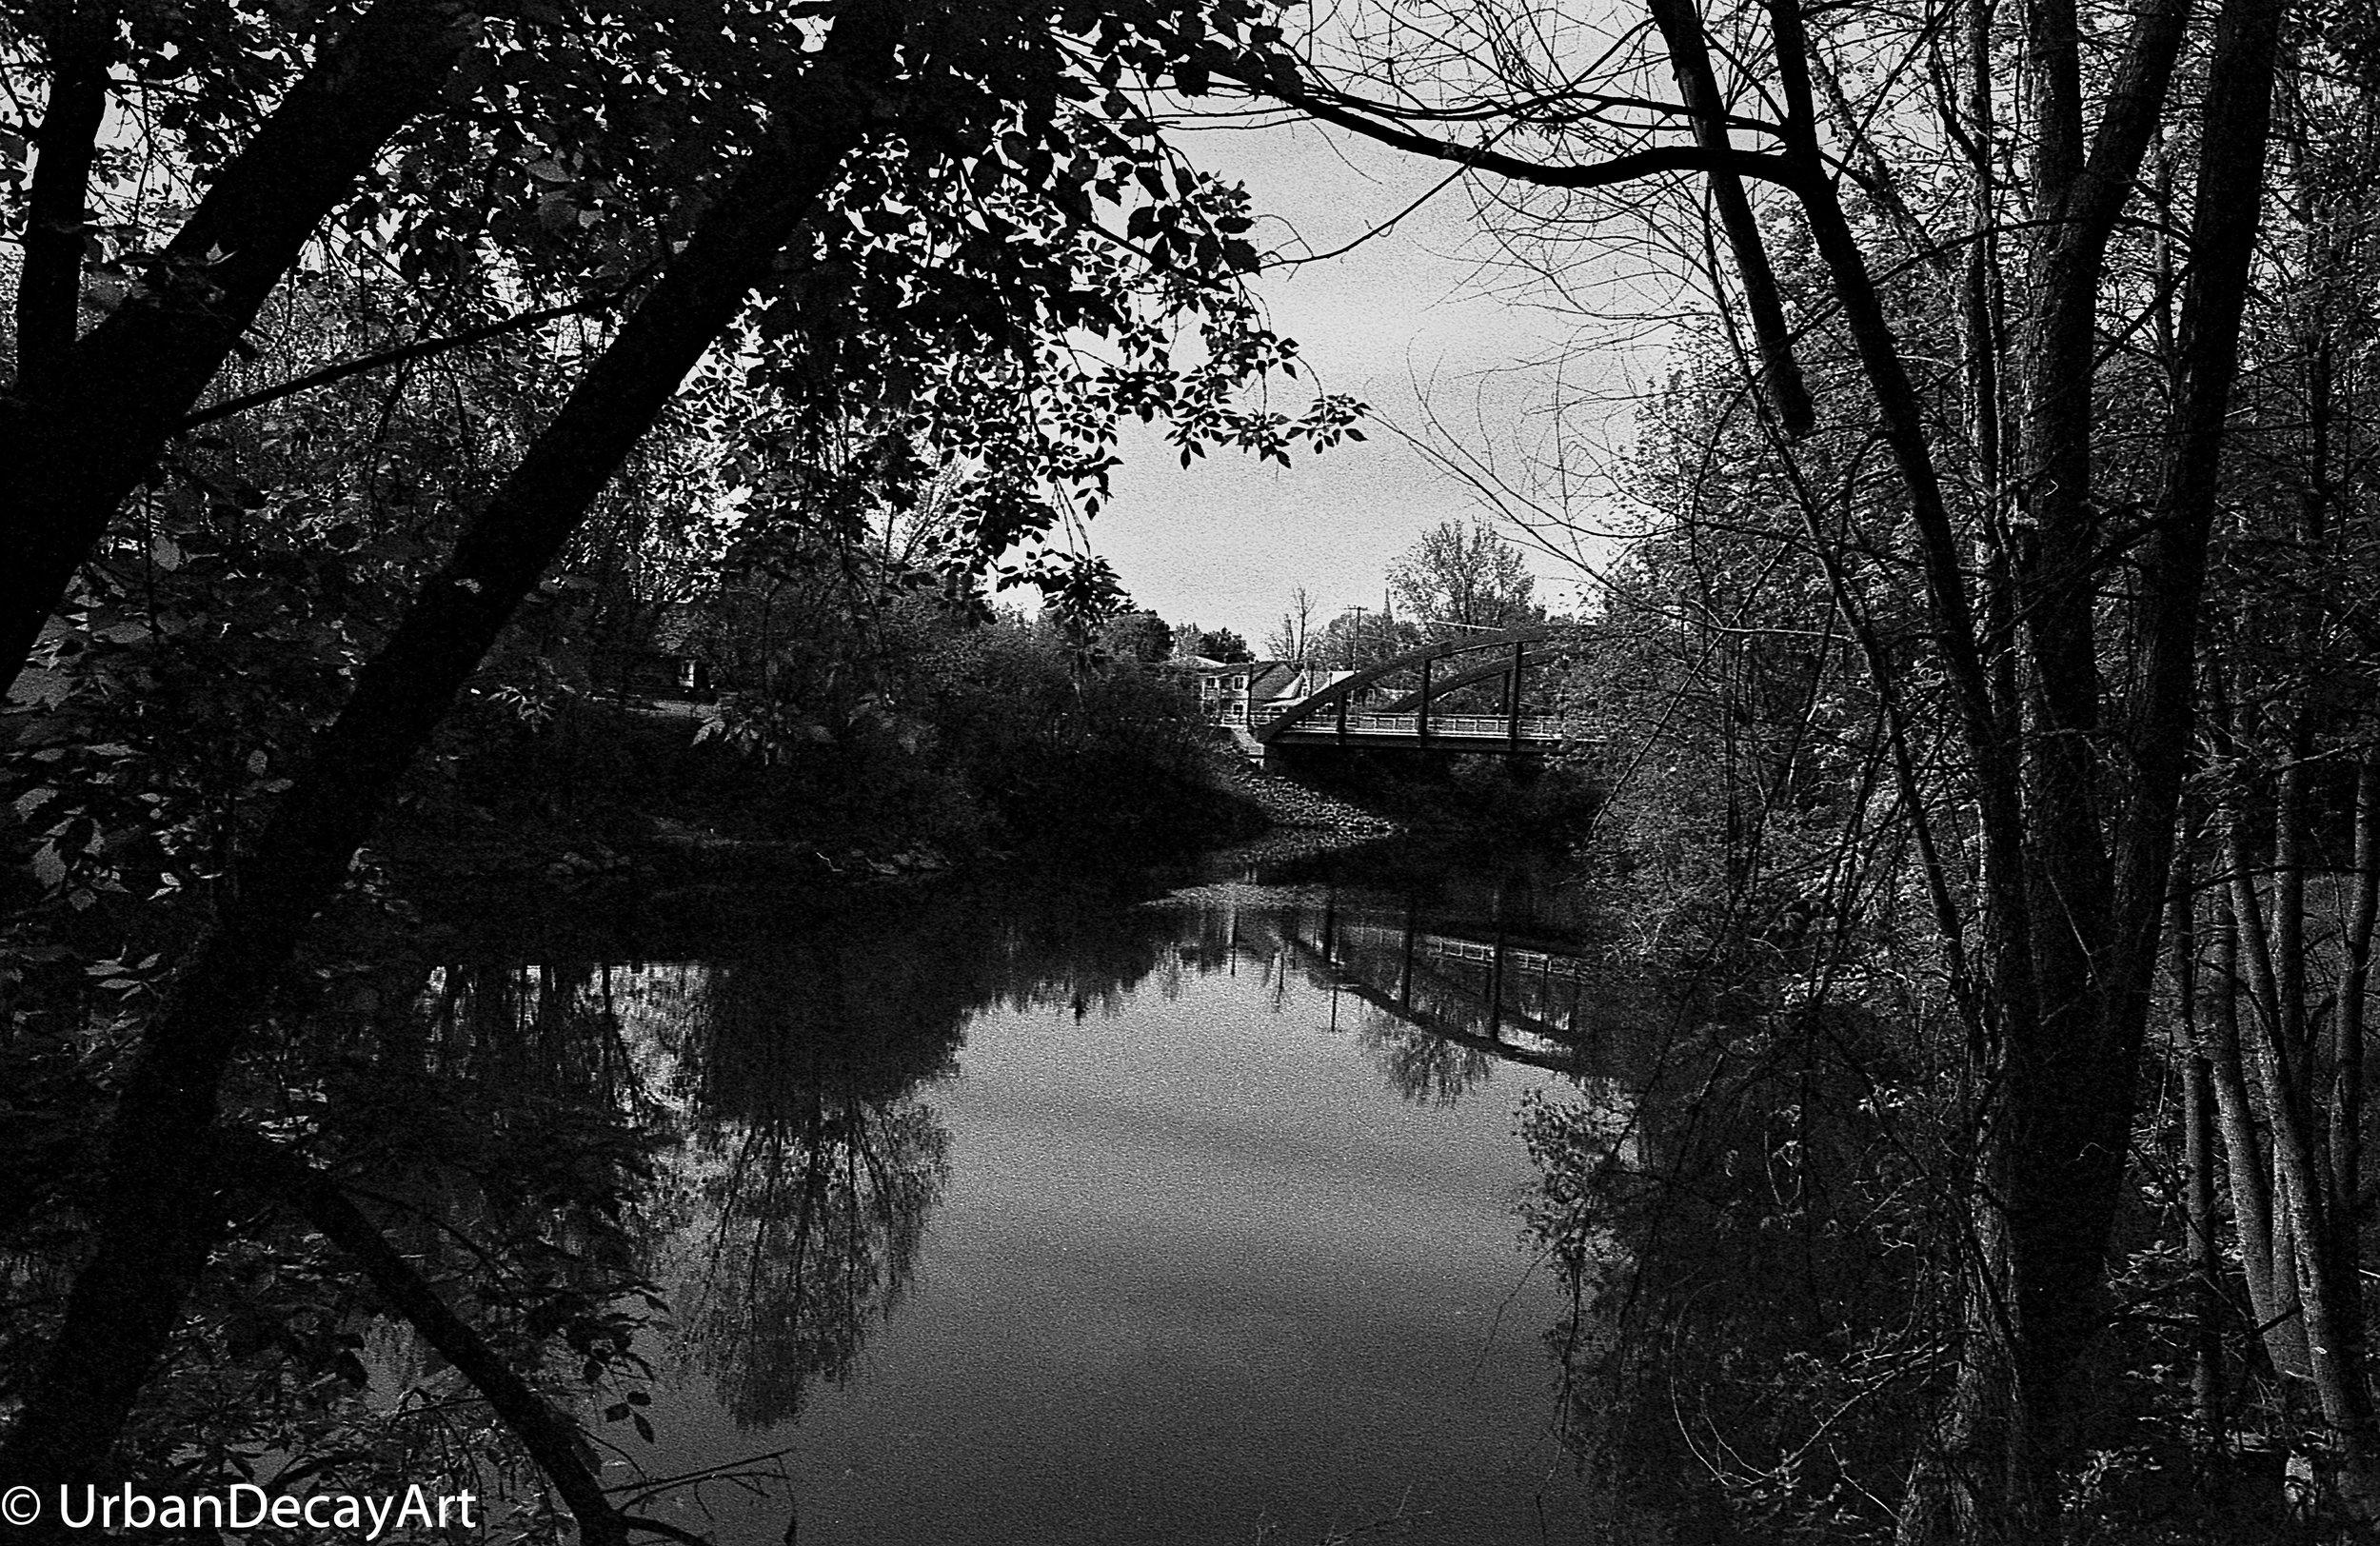 RiverBridgeOrmstown (1 of 1).jpg